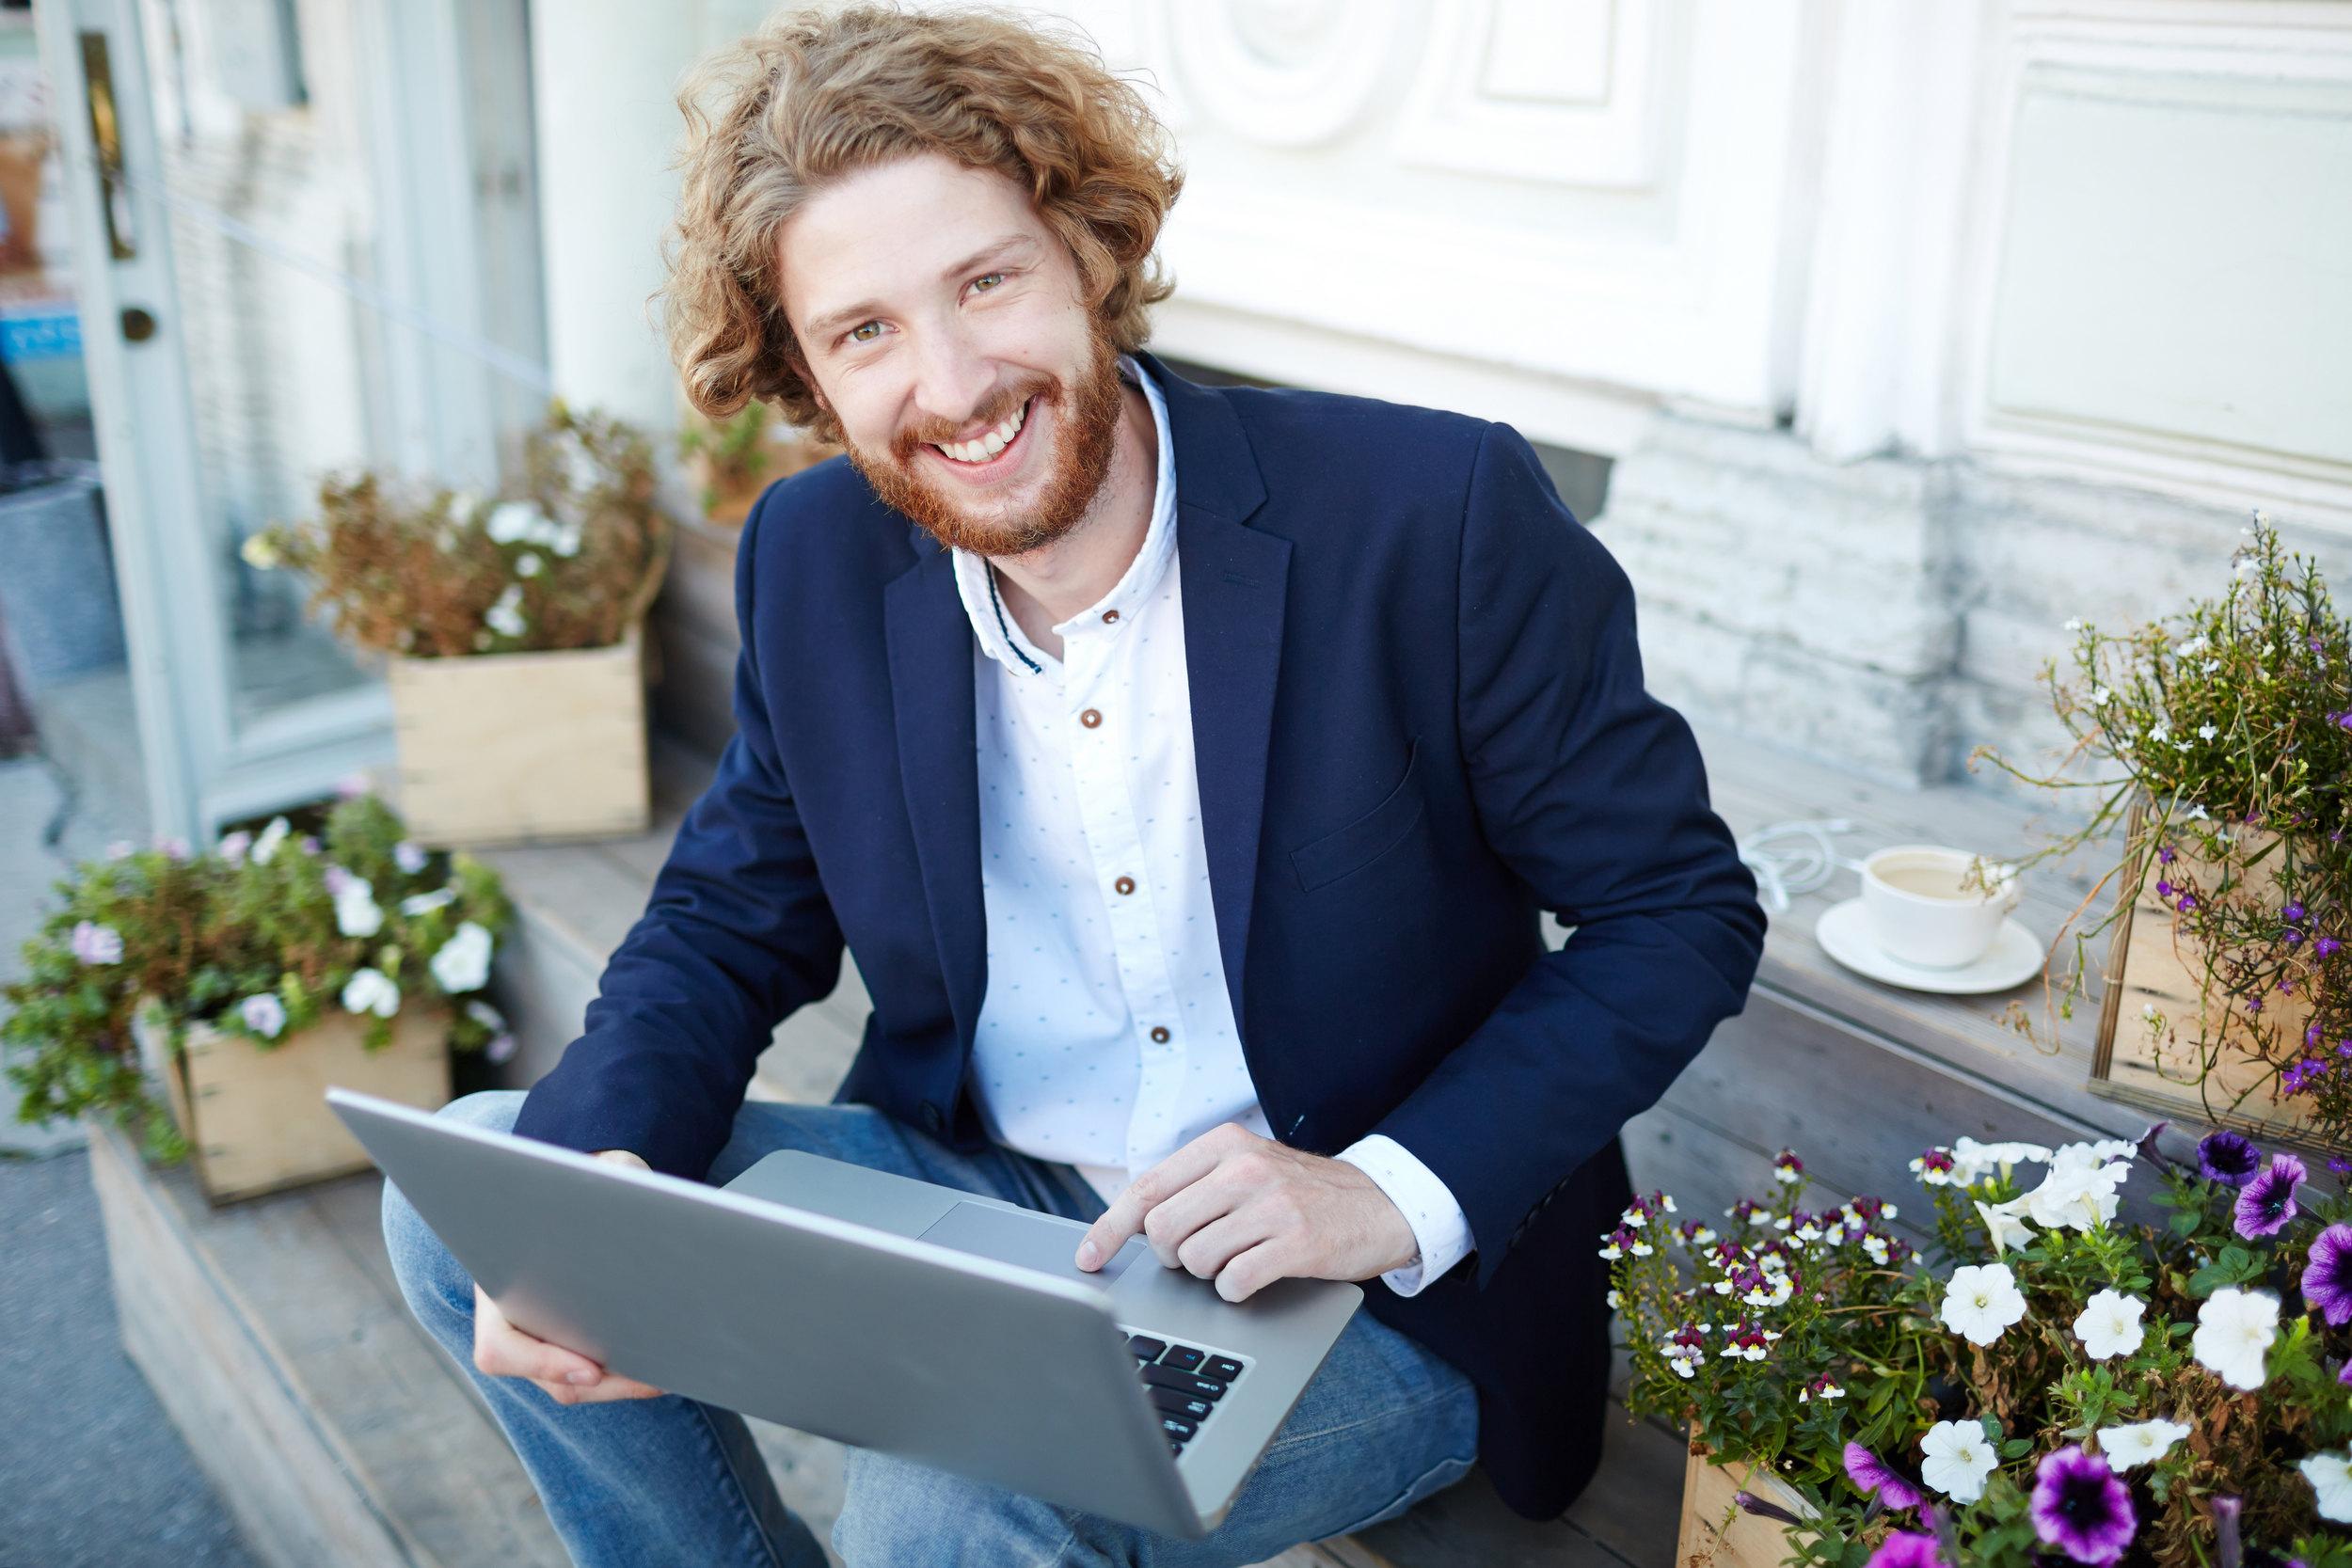 Geschäftsmann (oder Politiker) lächelt, während er am Laptop arbeitet